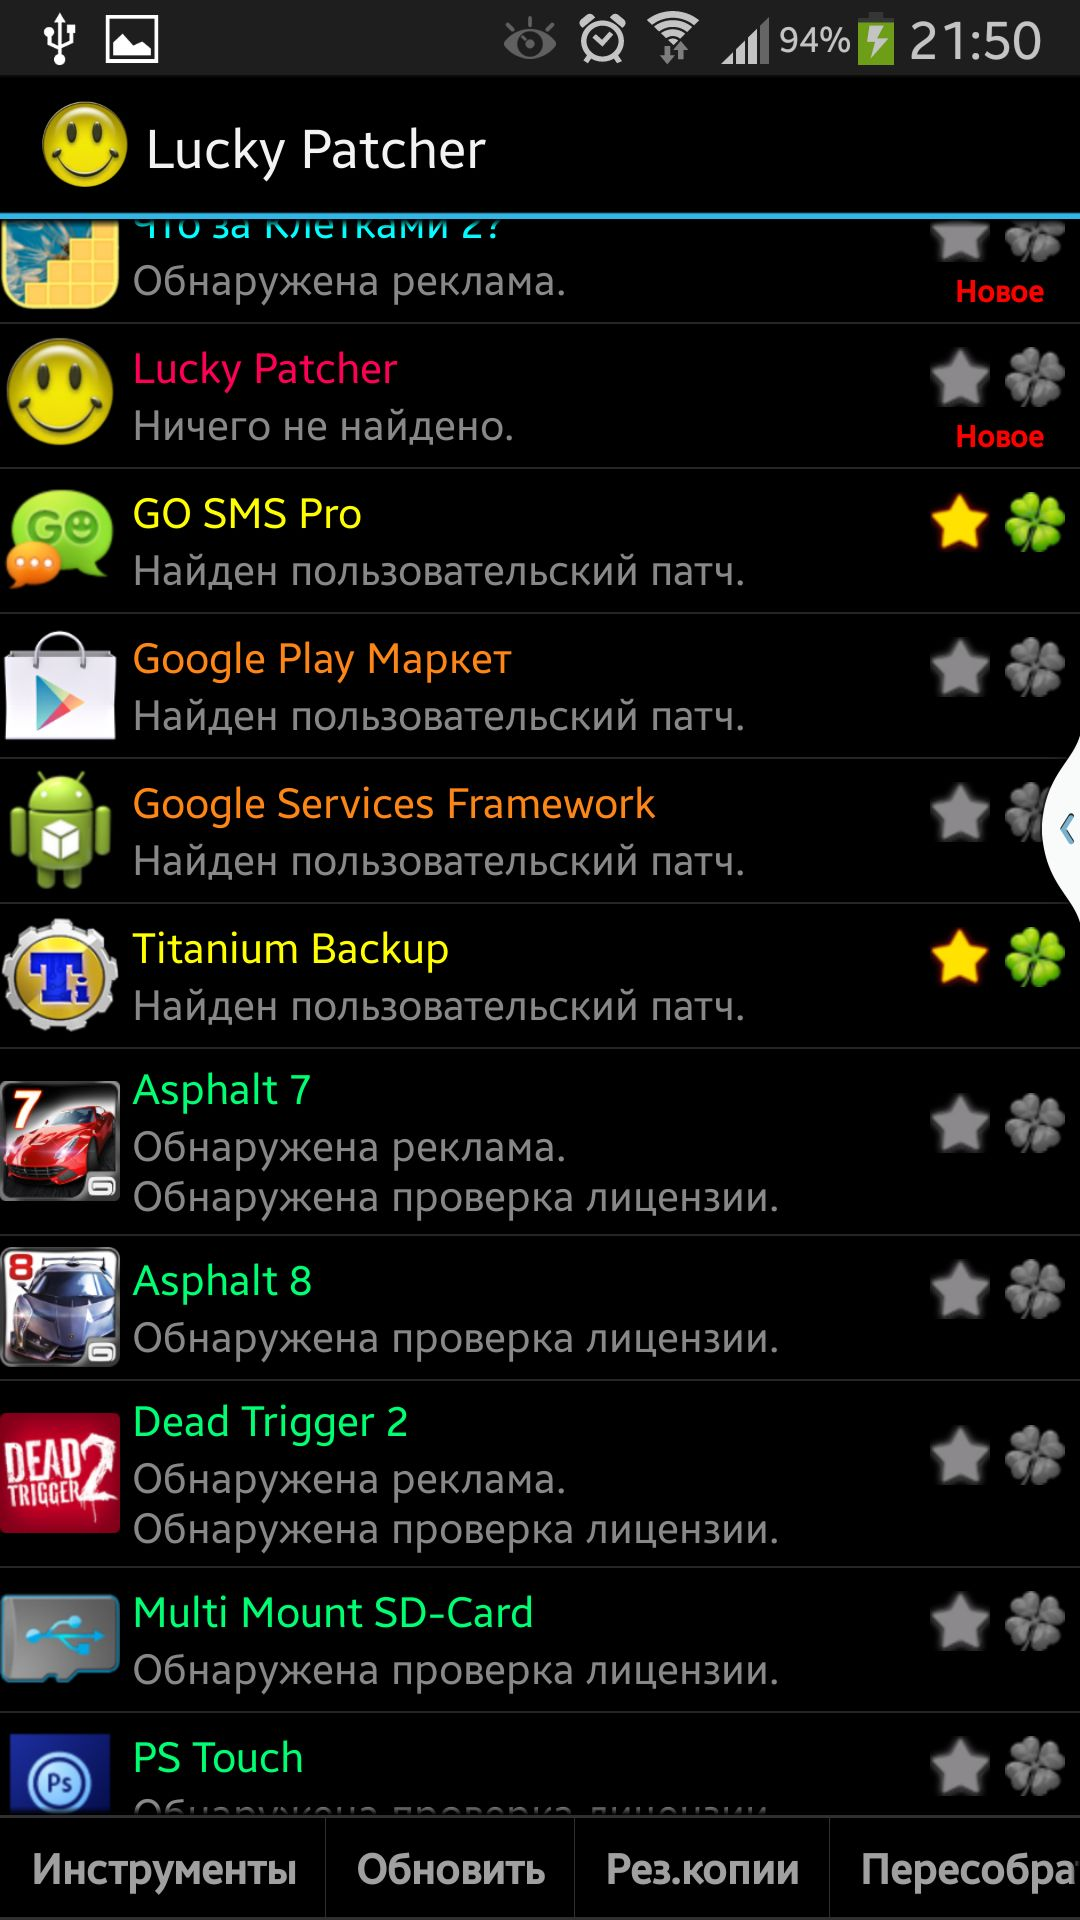 https://androidnonstop.ru/uploads/posts/2015-05/1432154334_screenshot-1.jpg